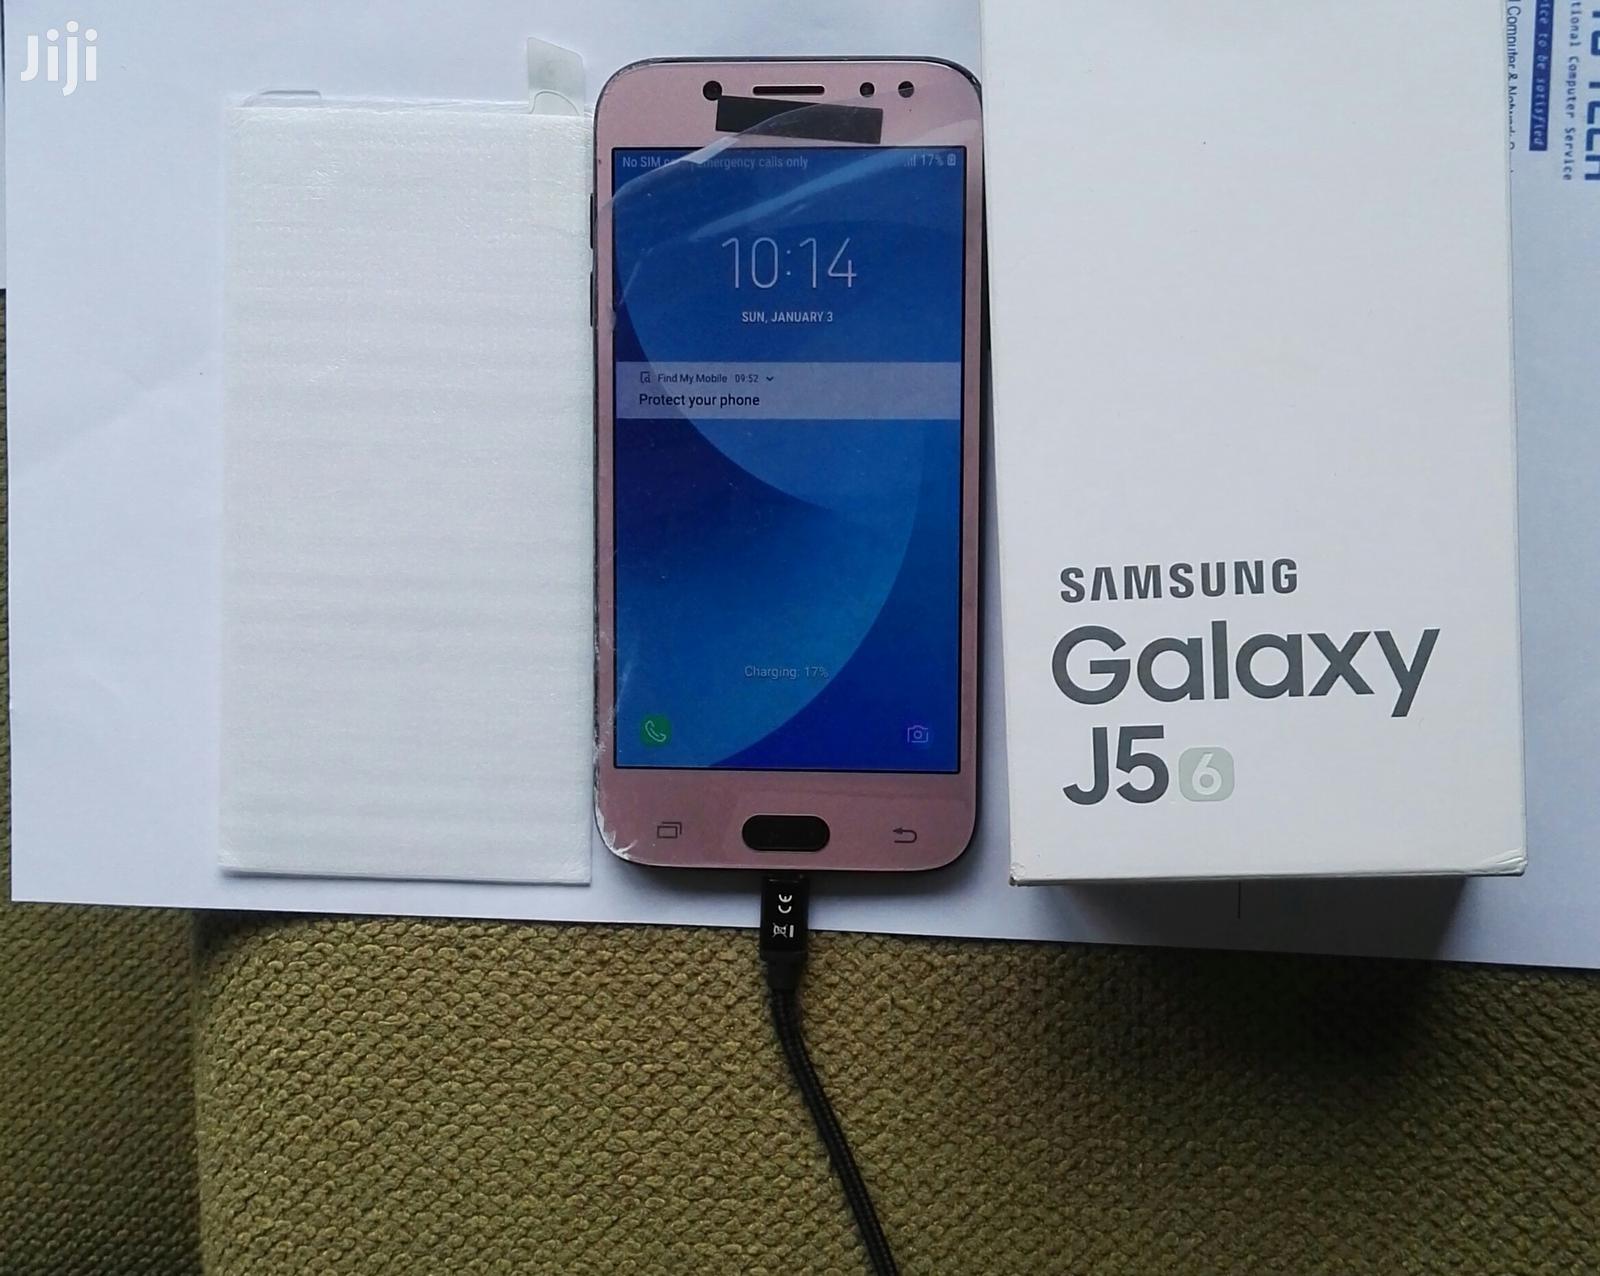 Samsung Galaxy J5 16 GB Pink